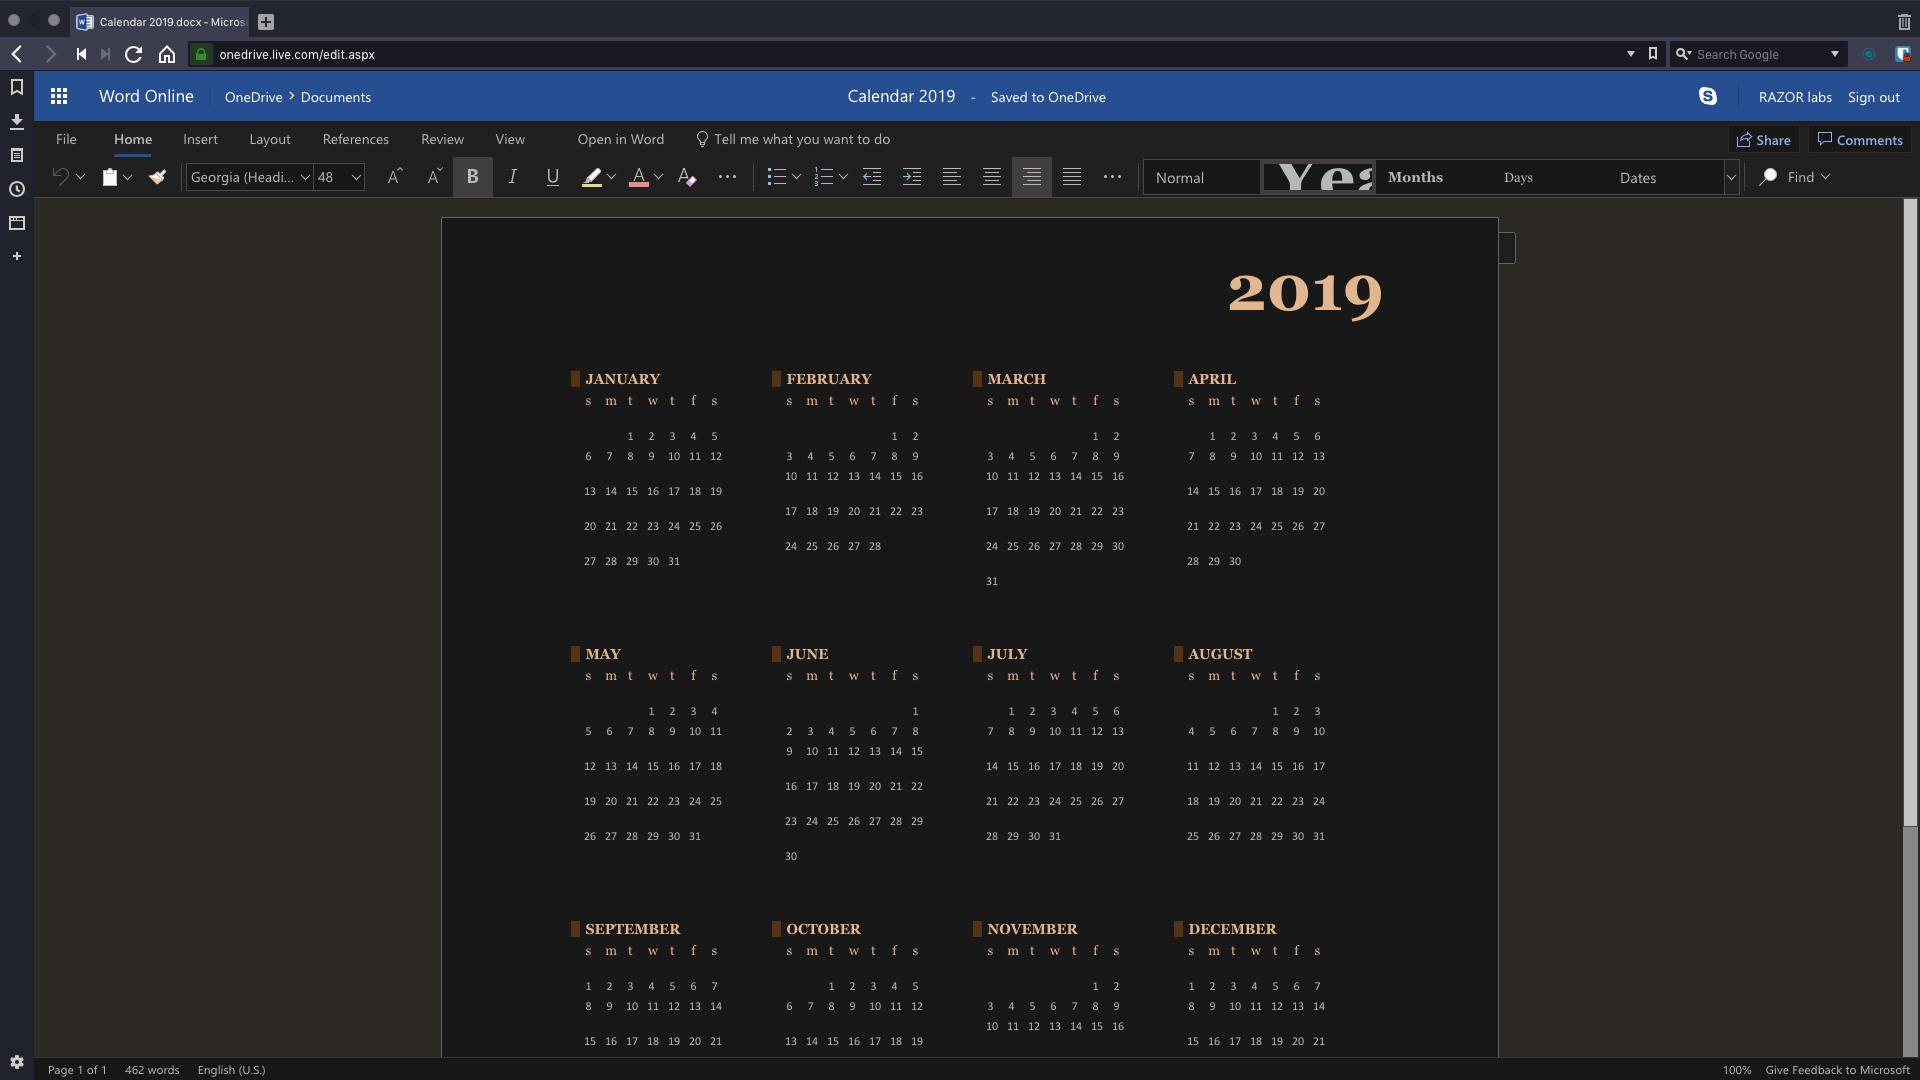 Calendar 2019.docx - Microsoft Word Online - Vivaldi 2019-01-14 12-57-04